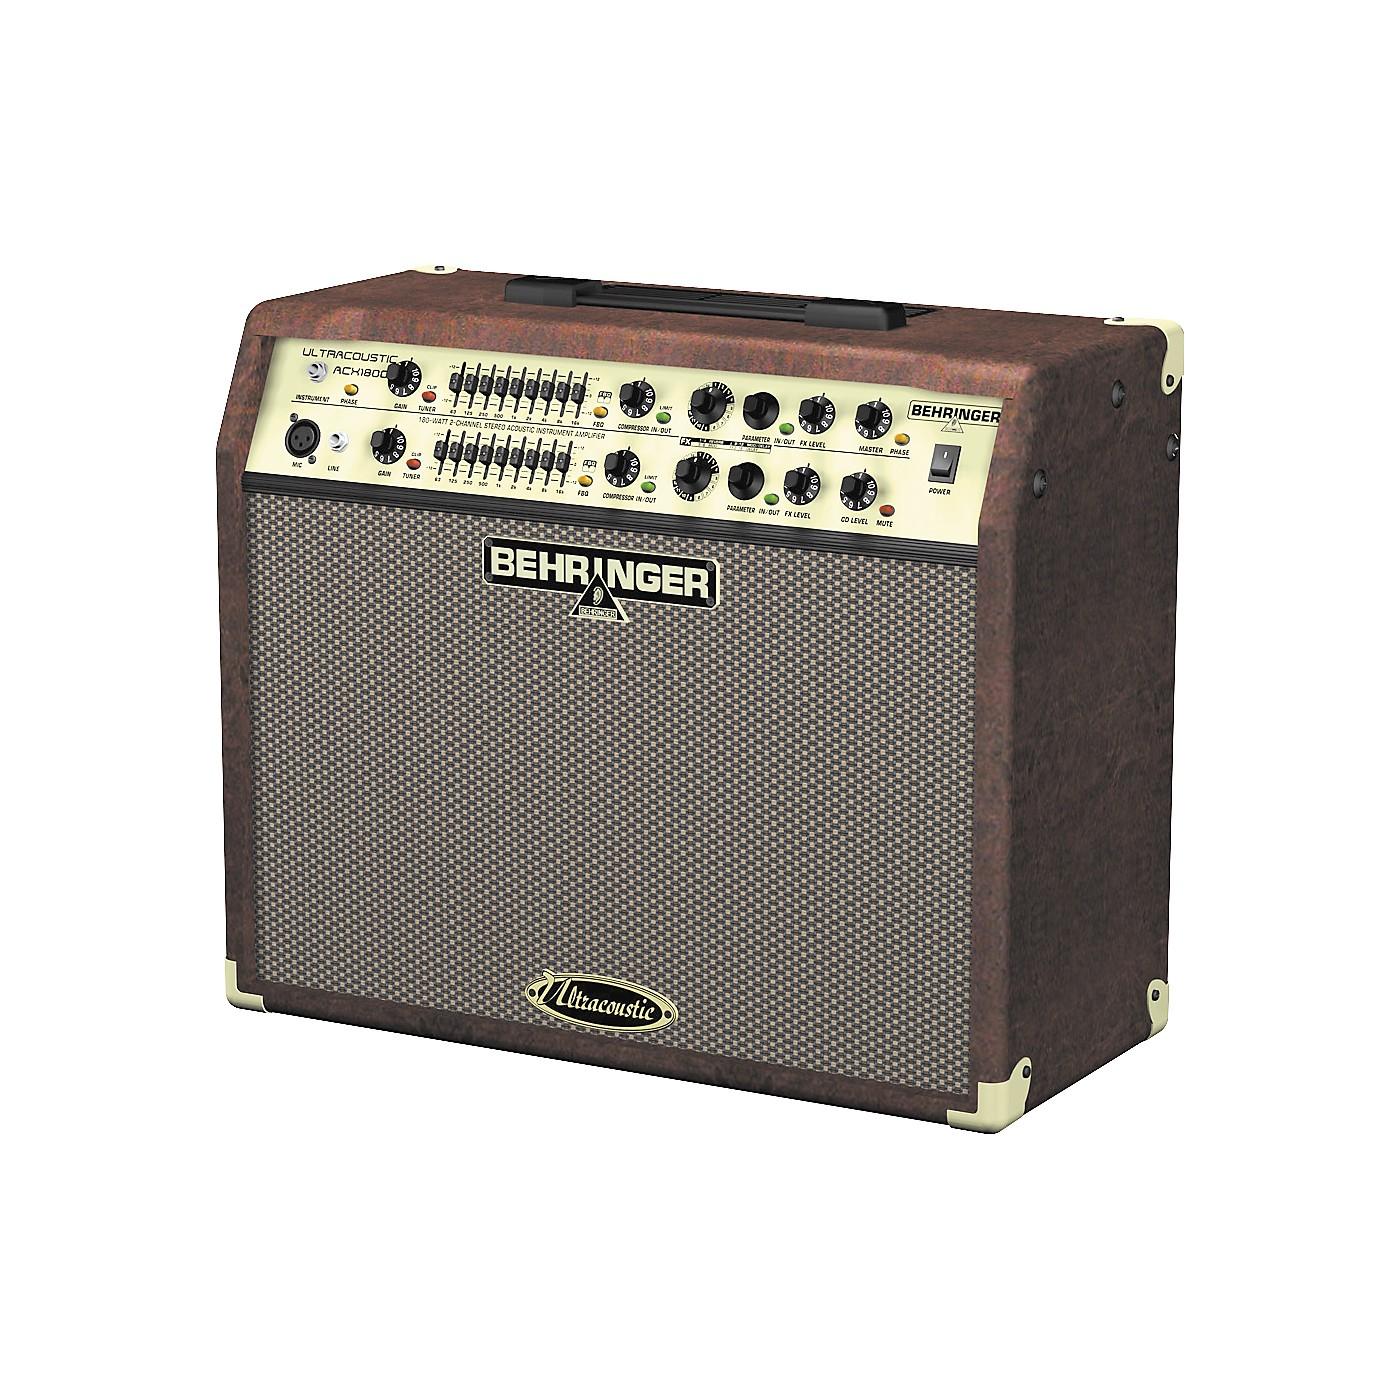 Behringer ULTRACOUSTIC ACX1800 Acoustic Guitar Amplifier thumbnail